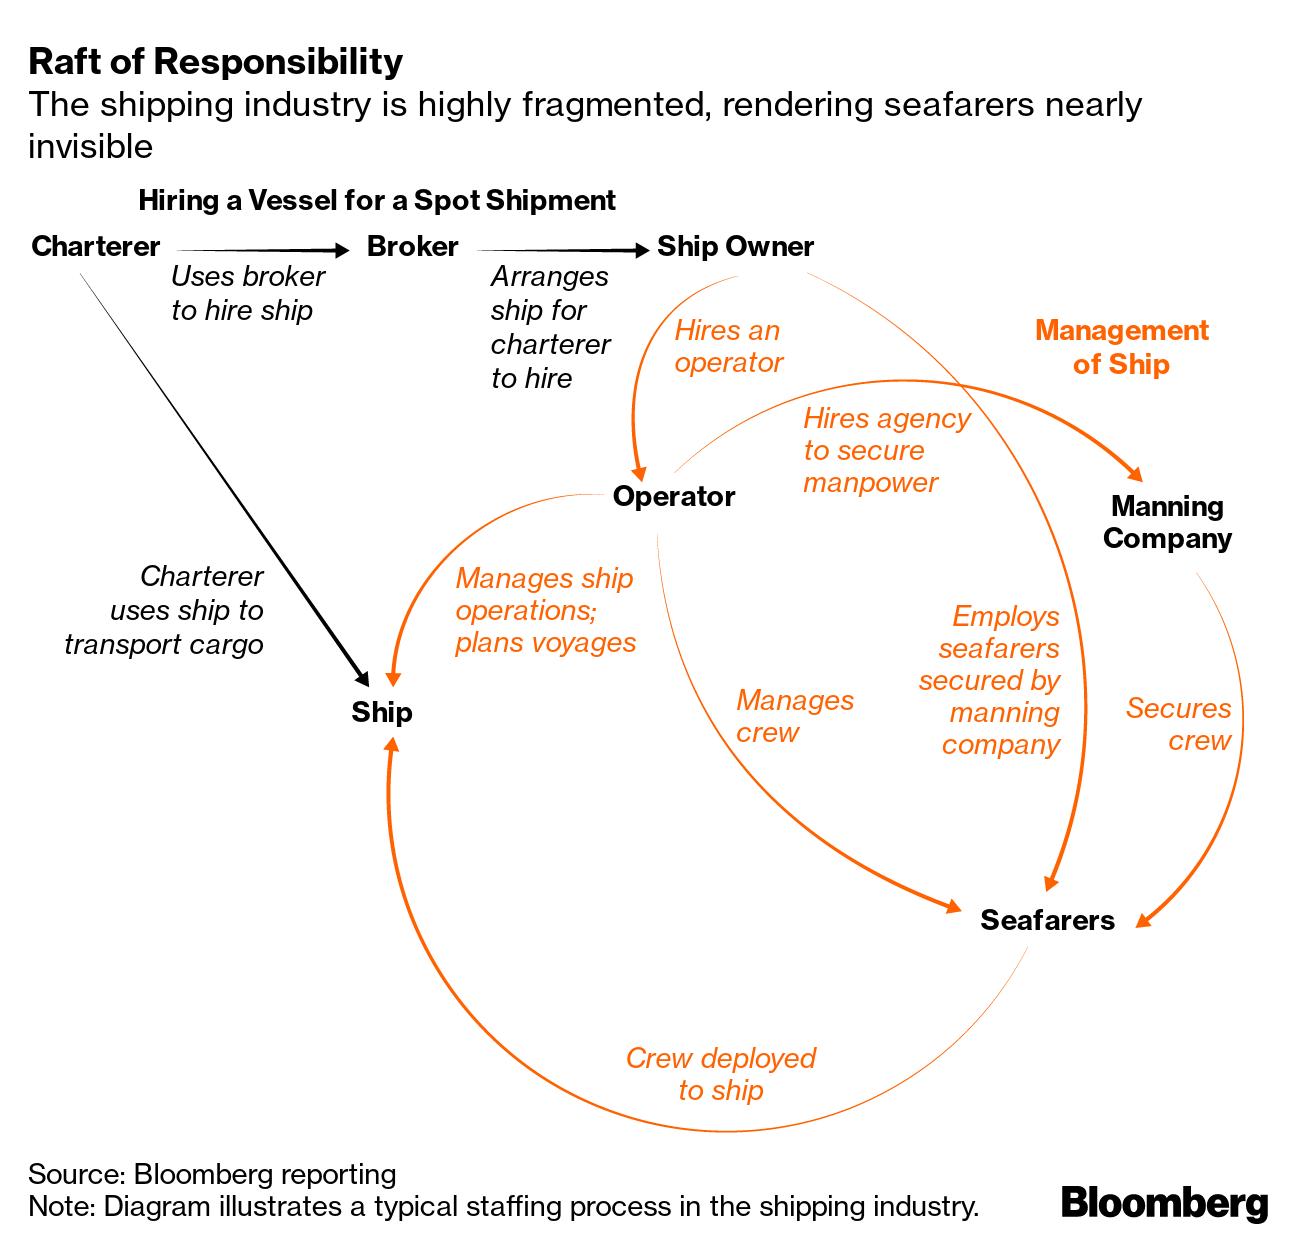 Raft of Responsibility